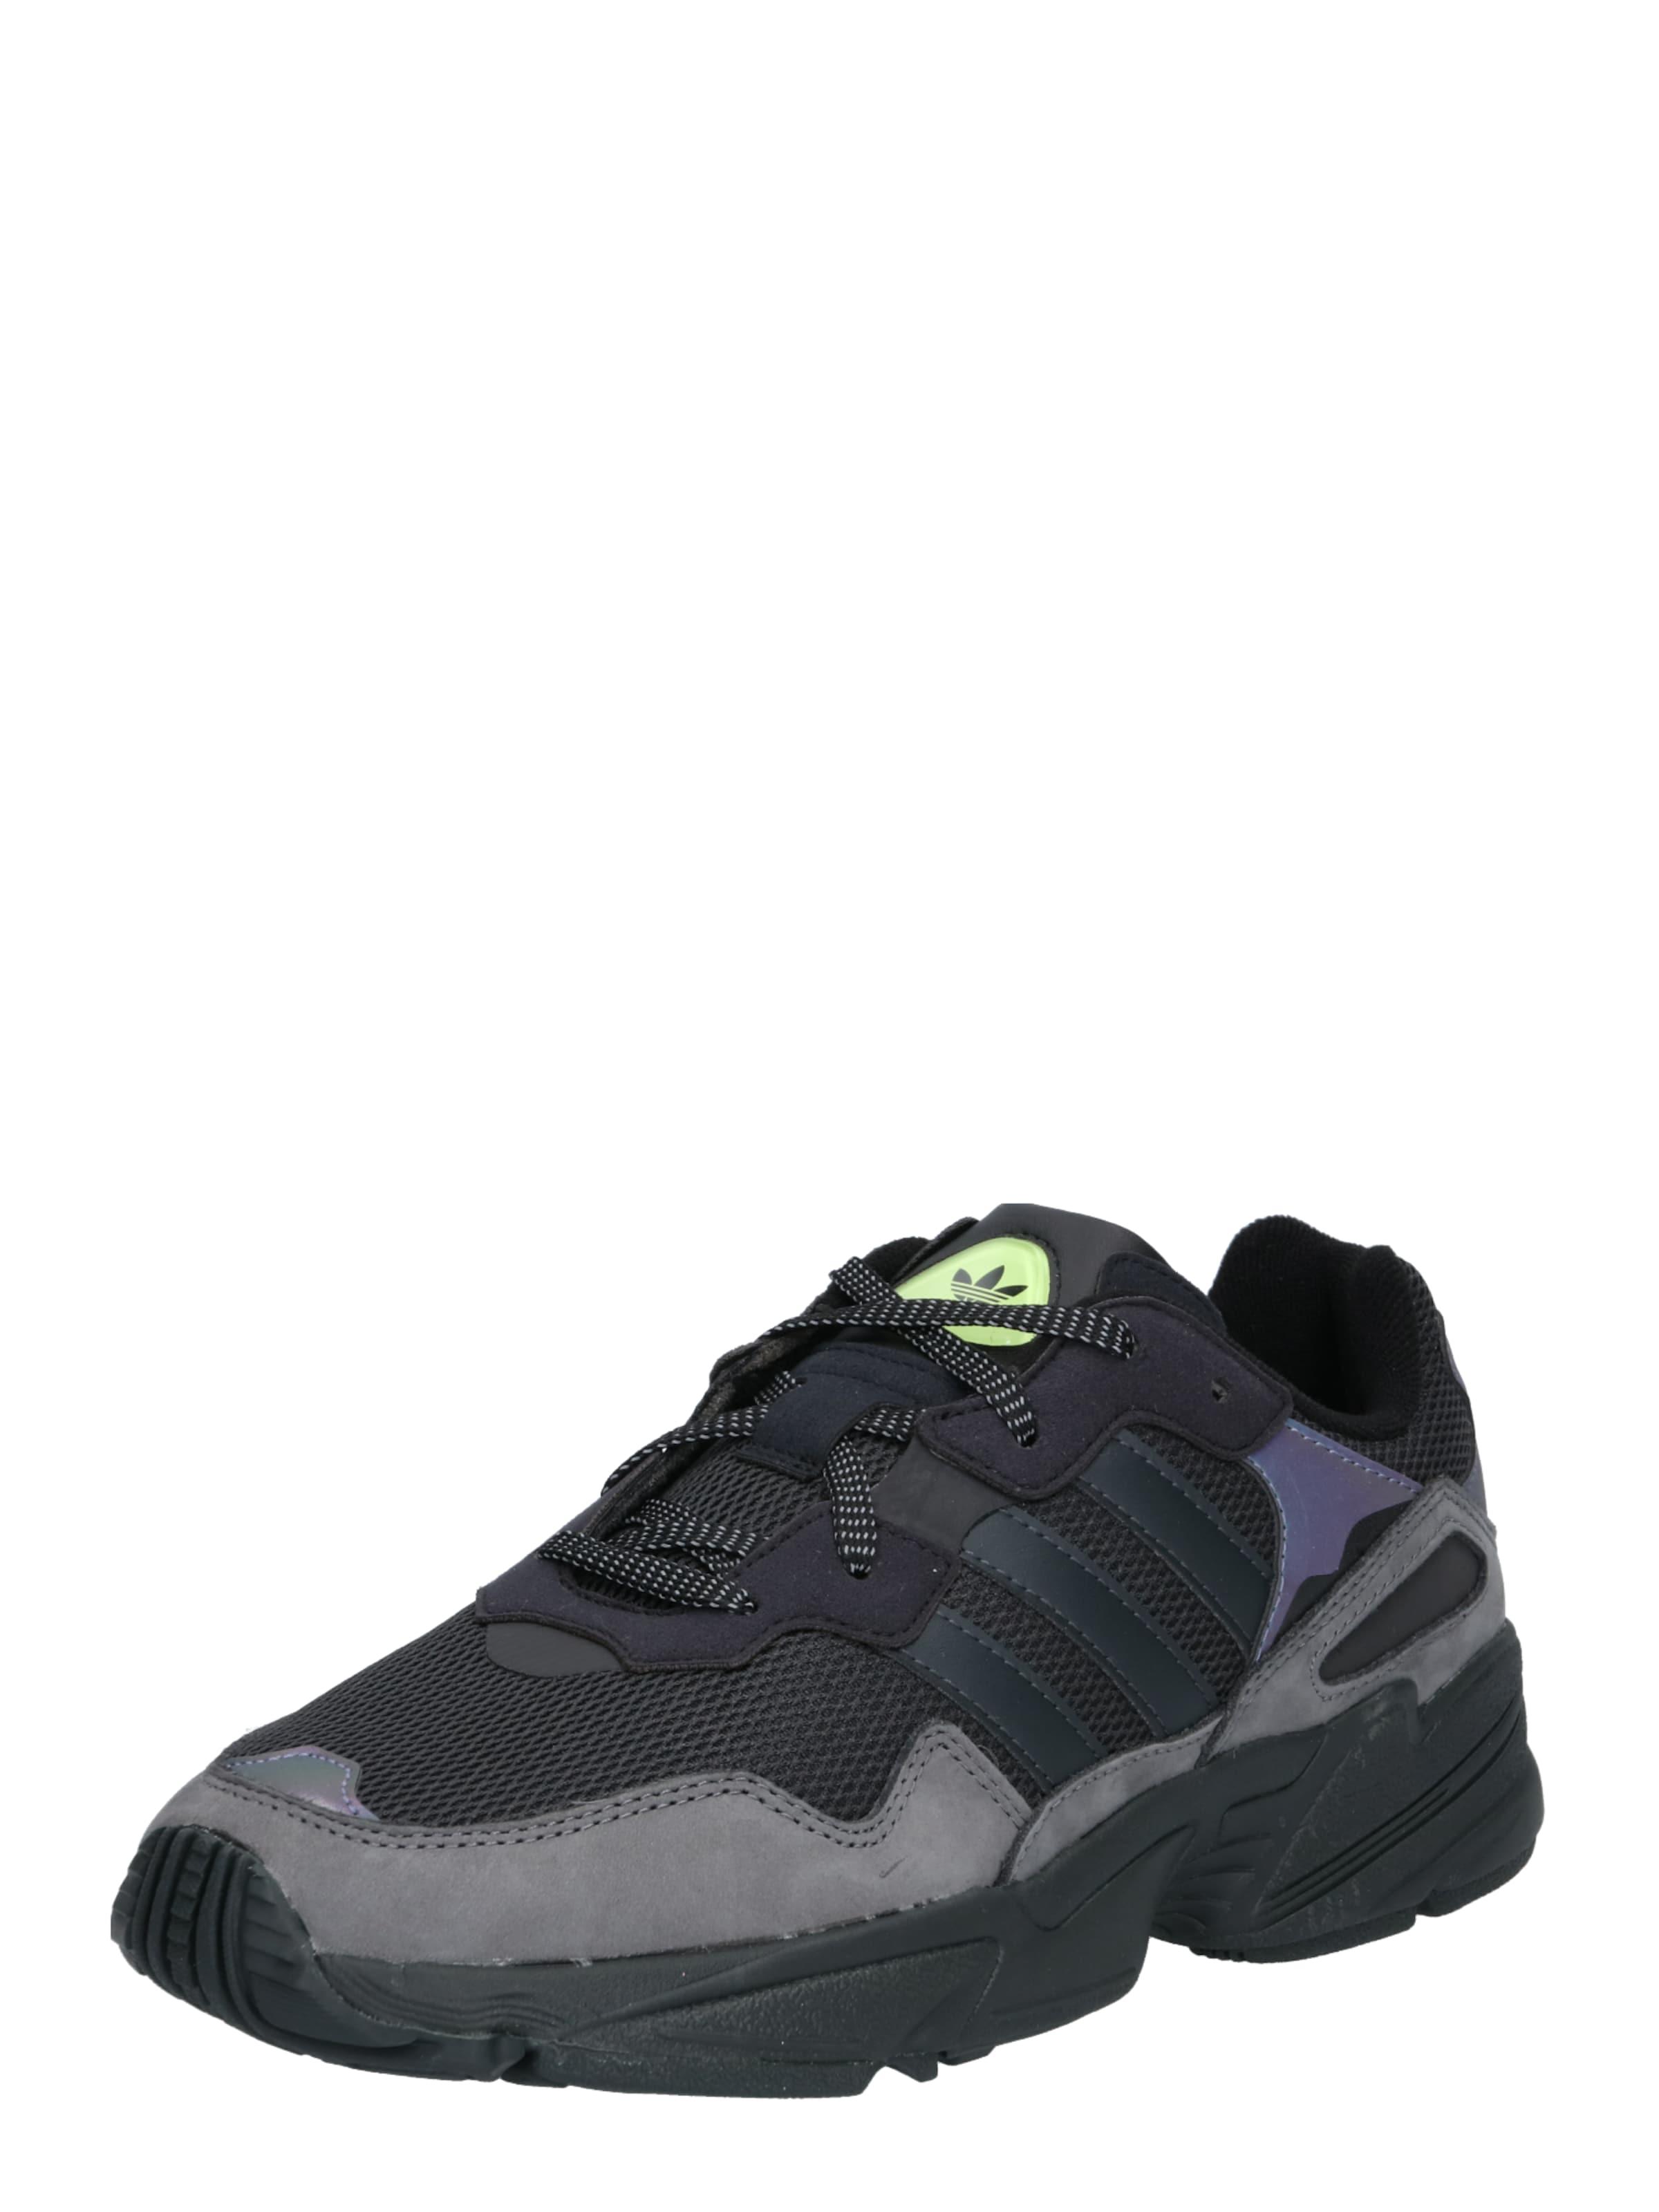 Originals 'yung In Sneaker Adidas 96' Schwarz rBdxCoe